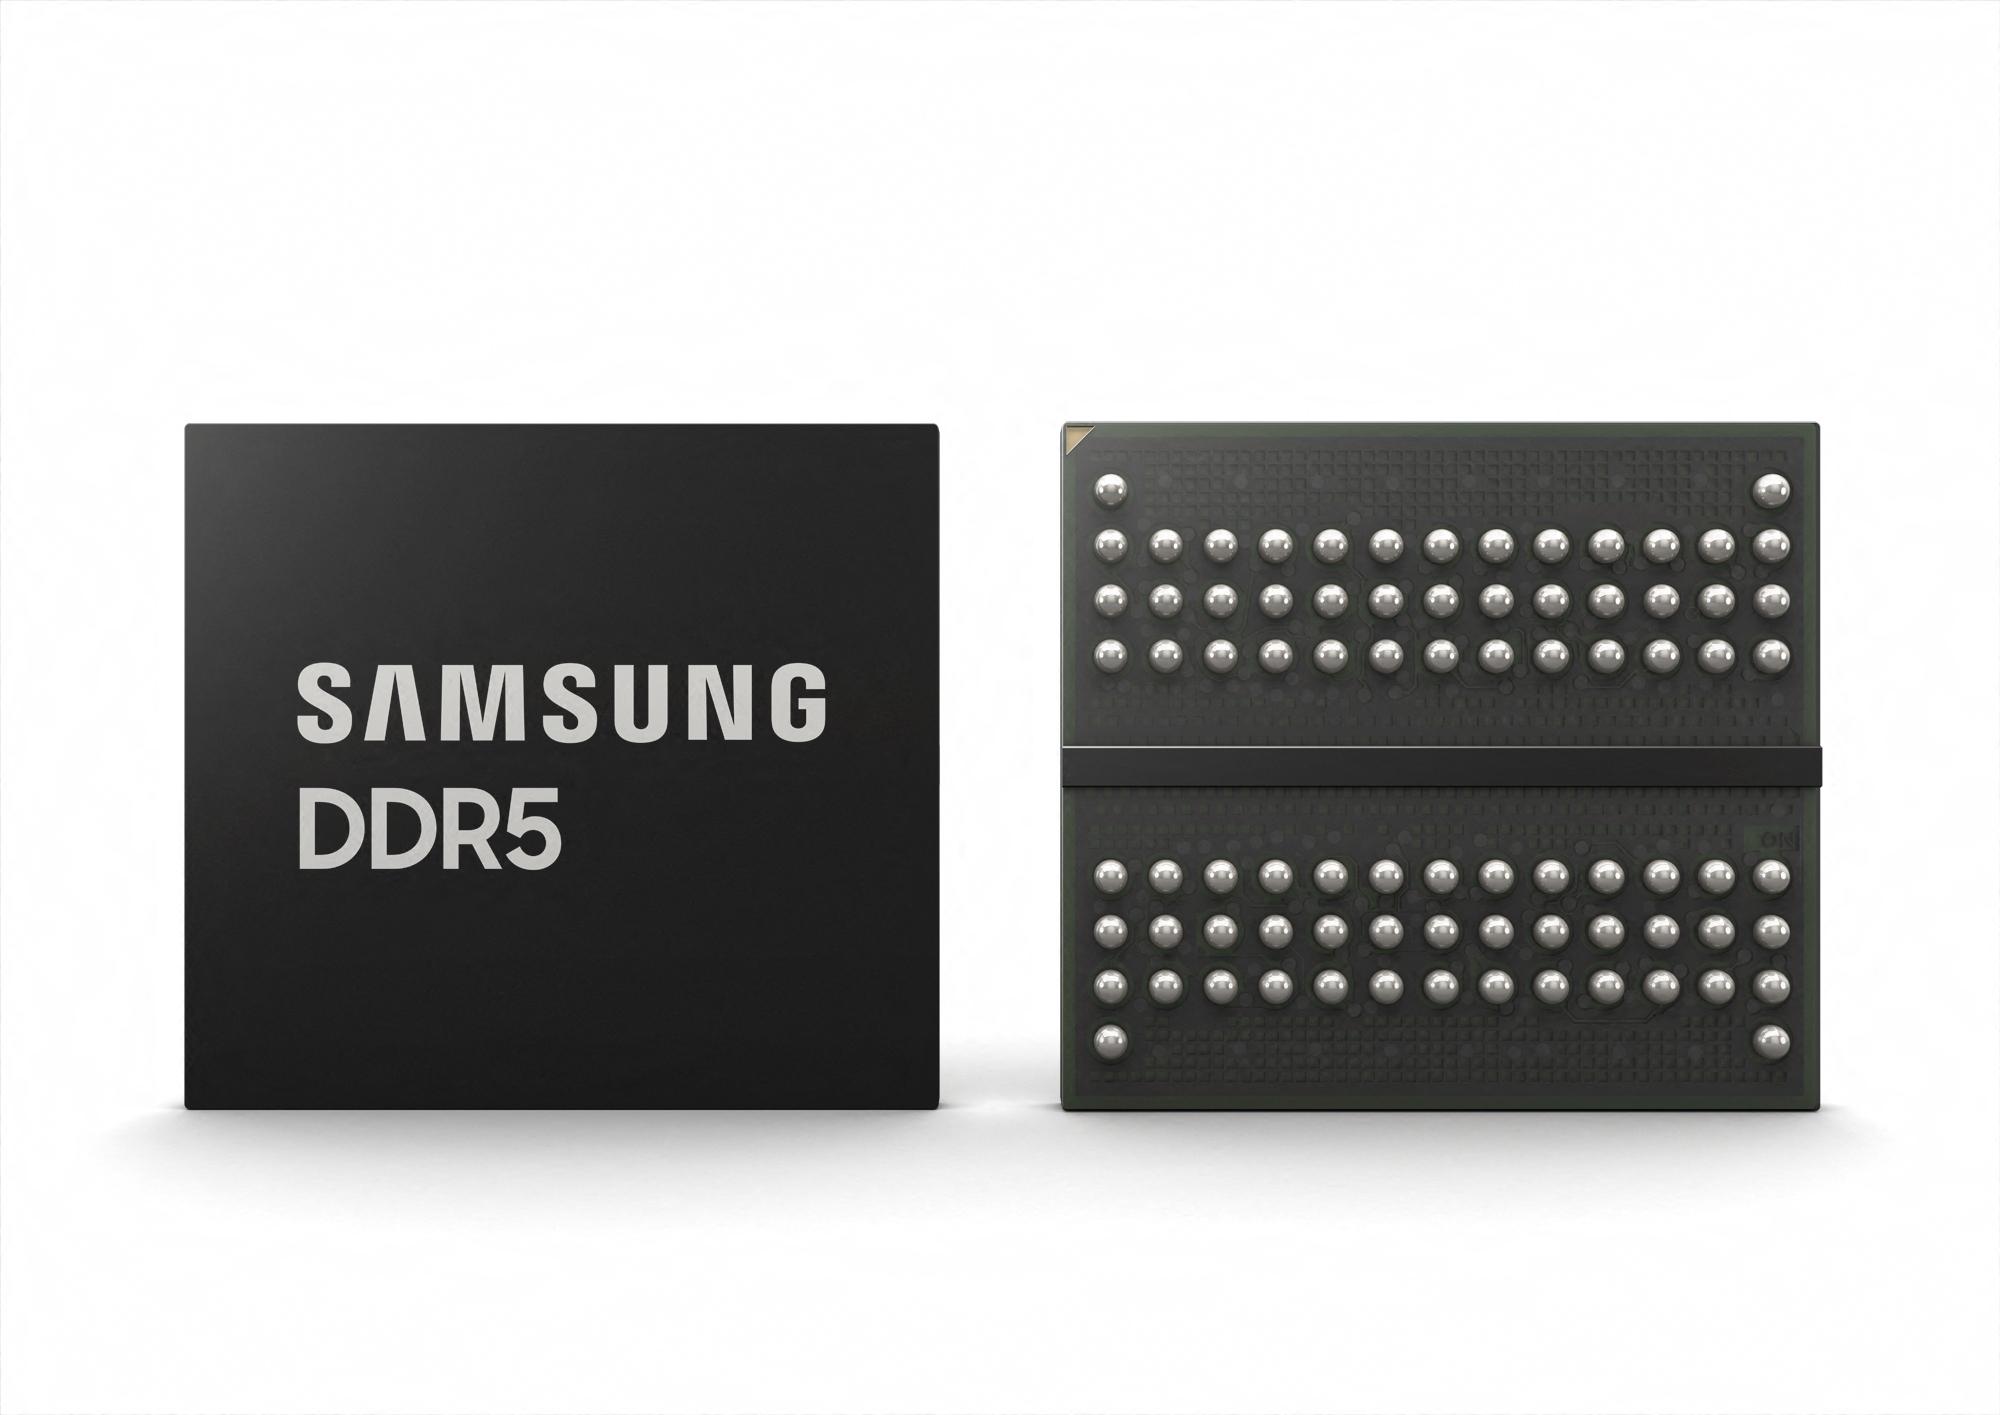 Samsung Starts Mass Production of Most Advanced 14nm EUV DDR5 DRAM